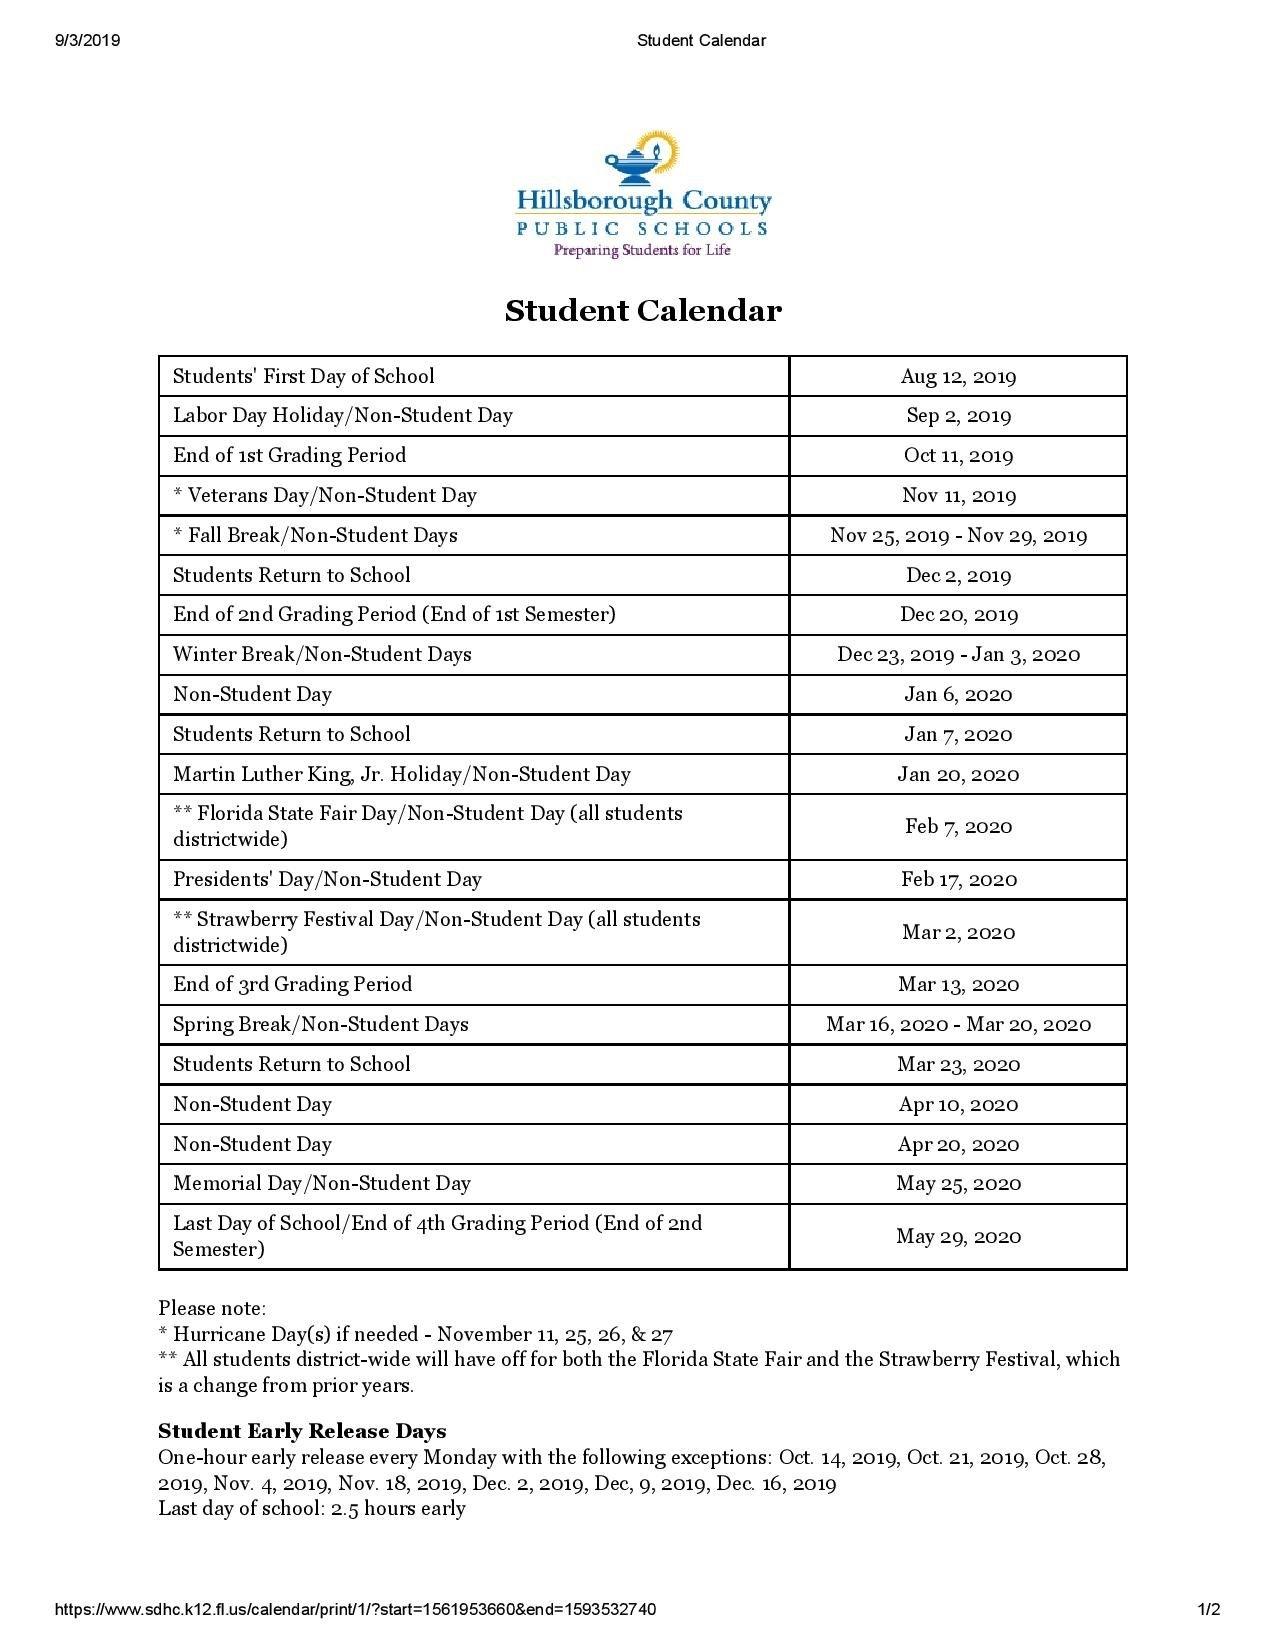 Take Hillsborough County School Calendar 2021